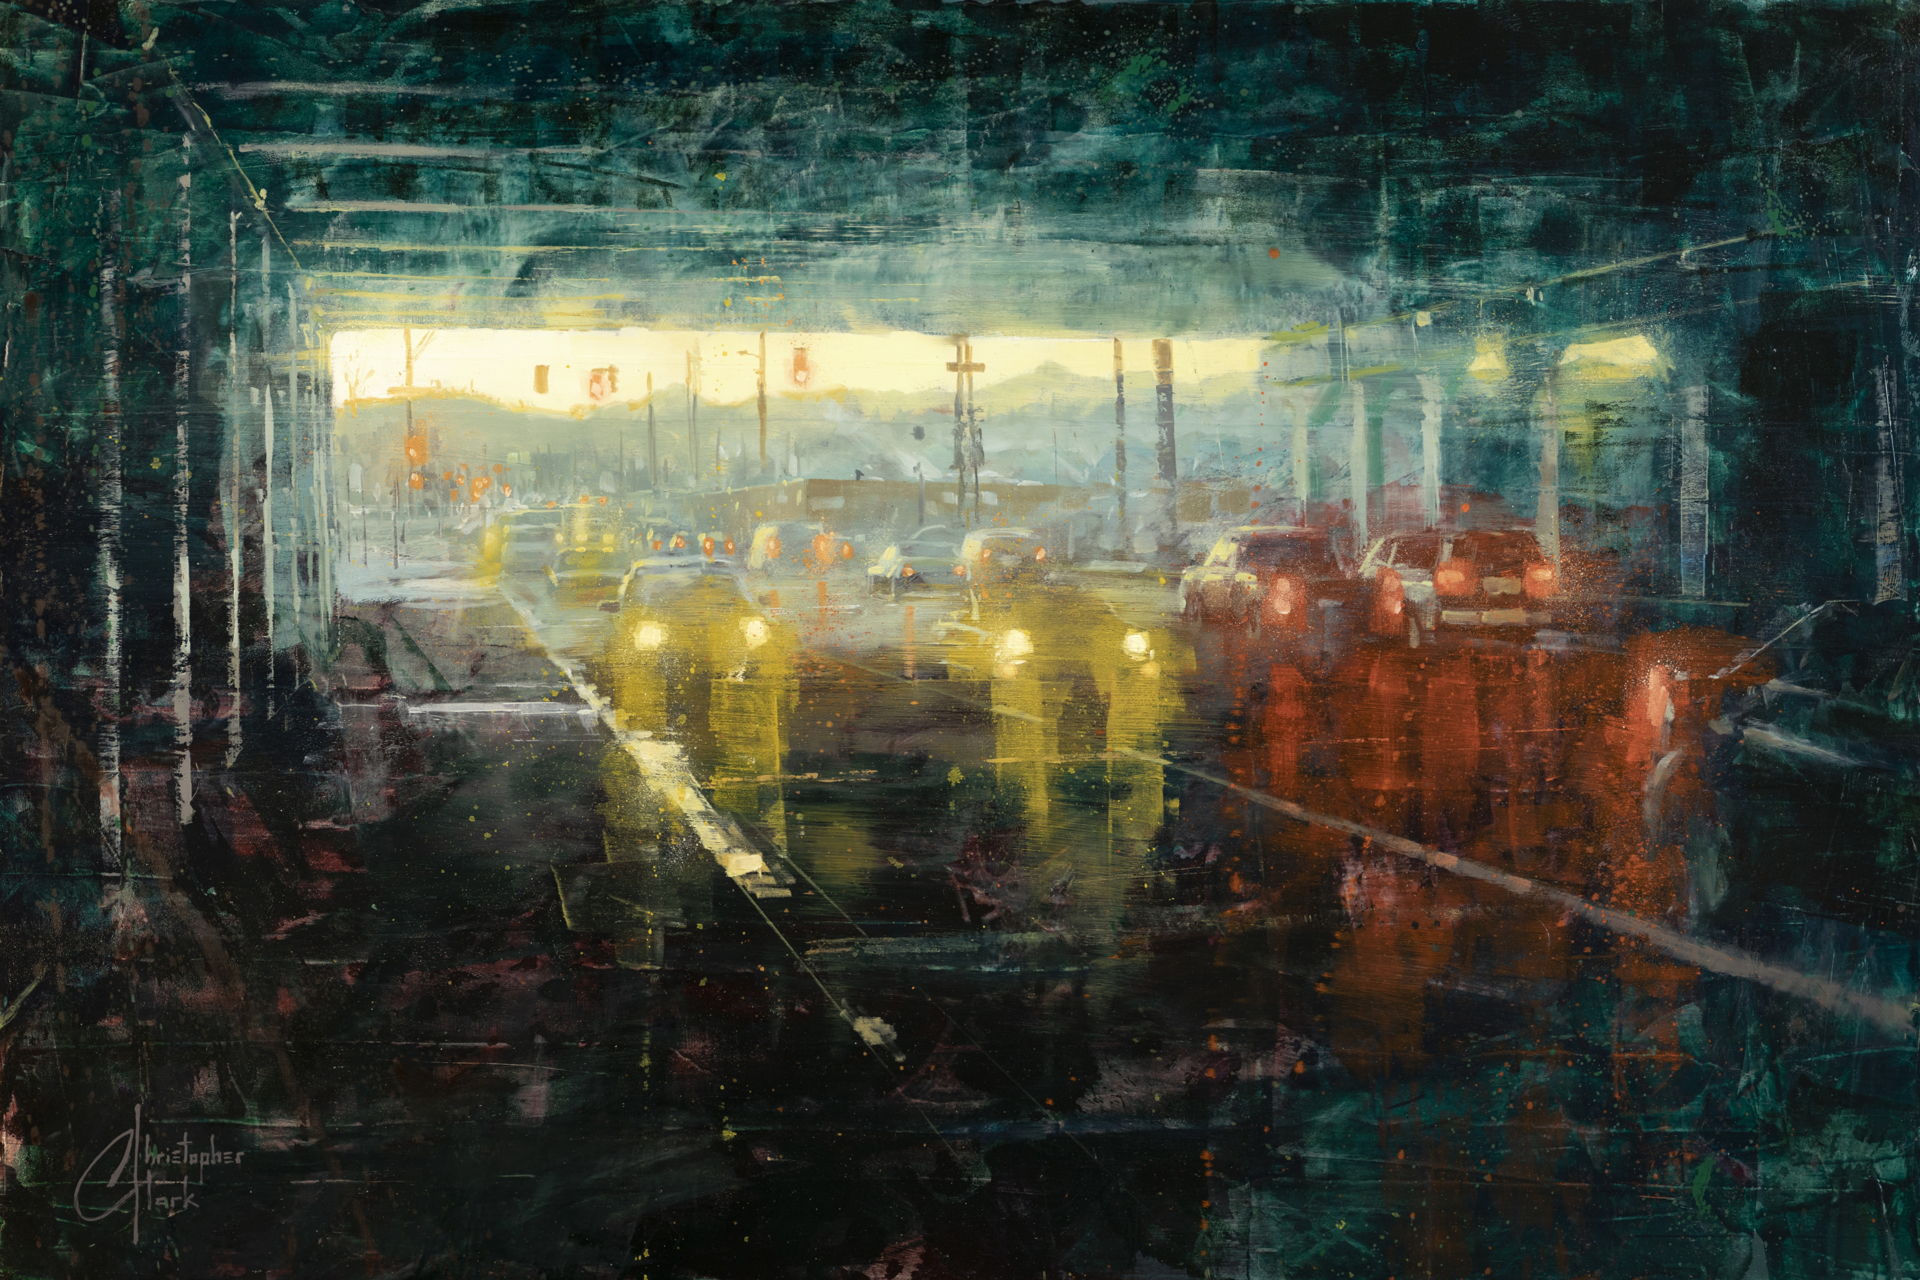 Denver - Under the 8th St Bridge by Christopher Clark